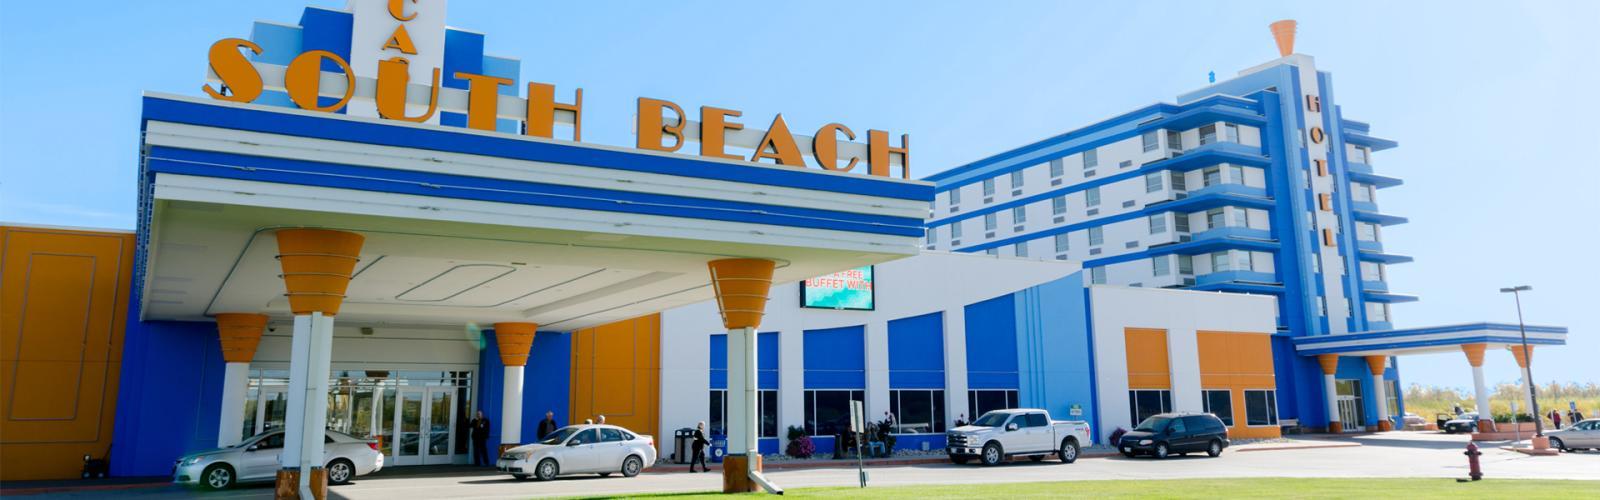 south beach casino surf and turf